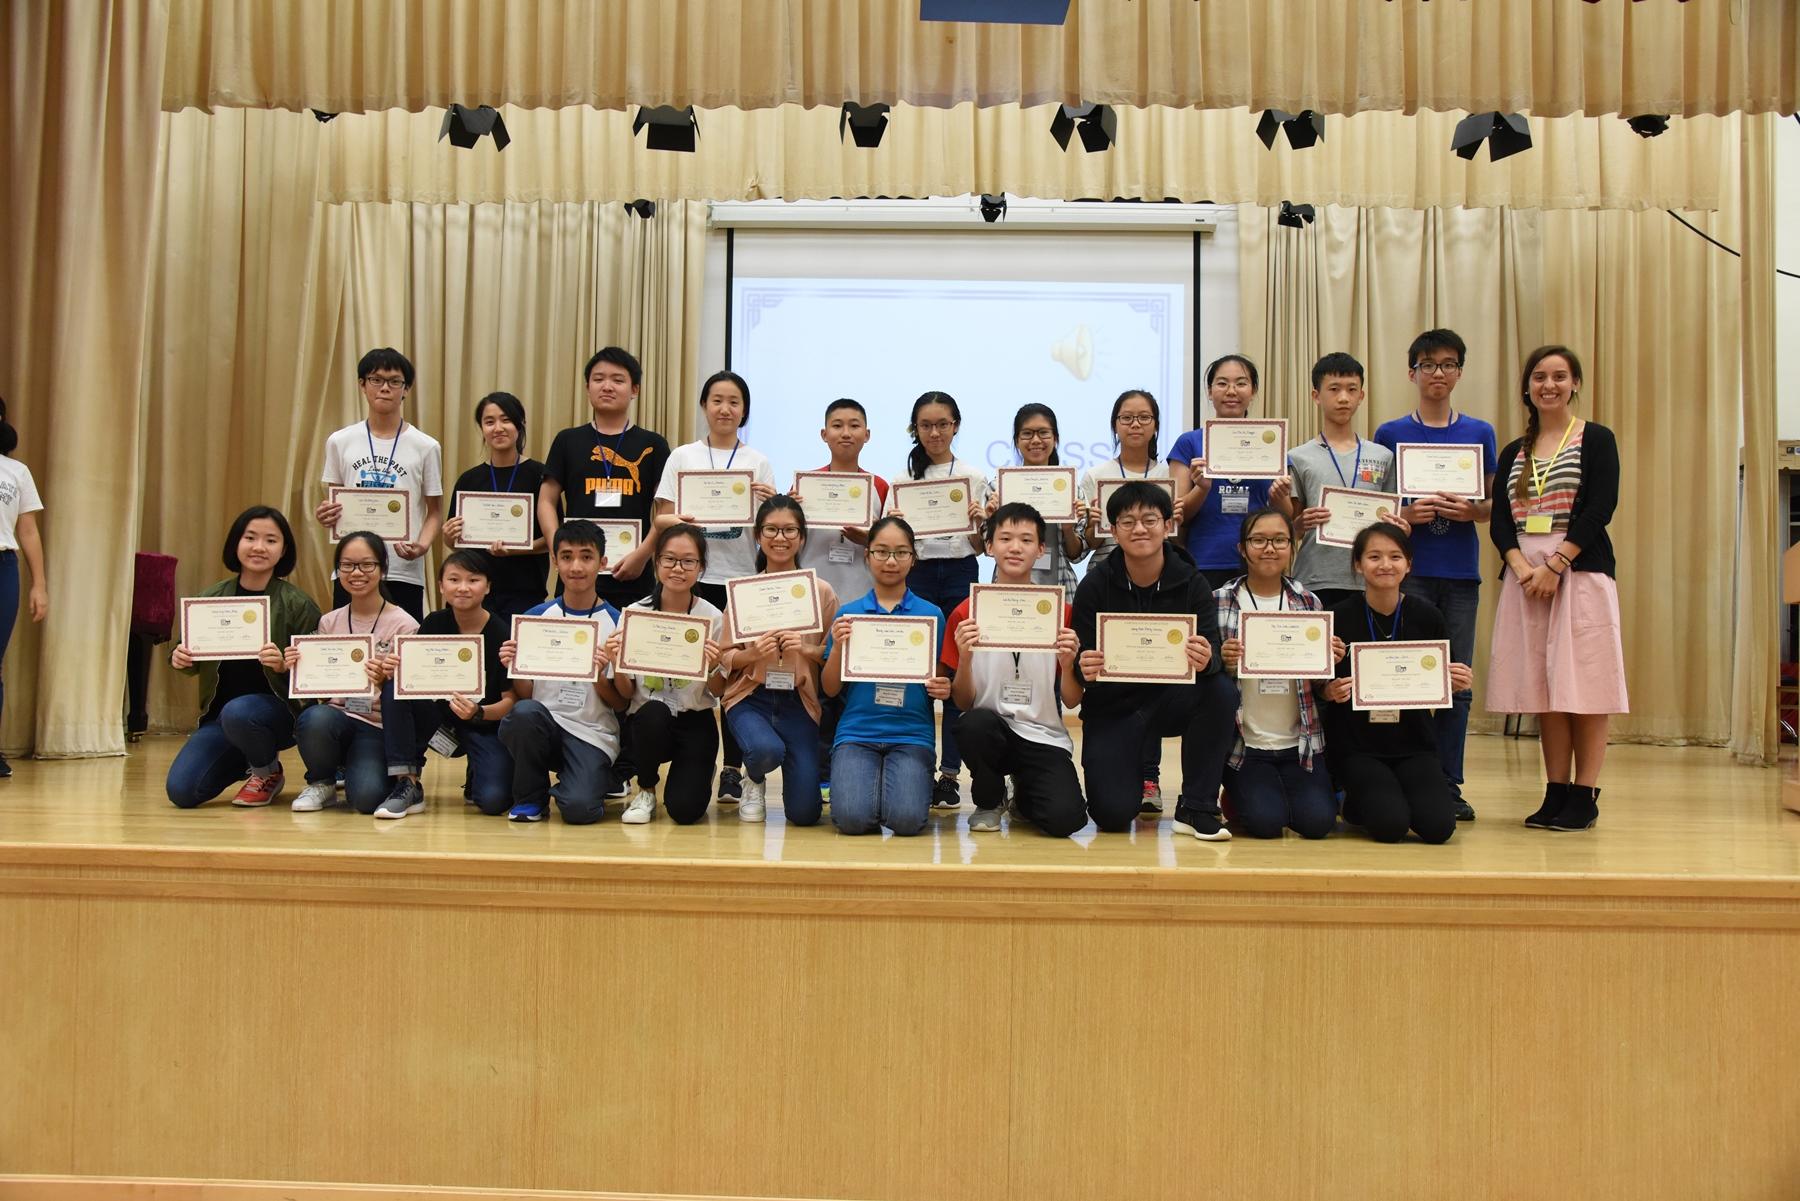 http://www.npc.edu.hk/sites/default/files/dsc_0260.jpg